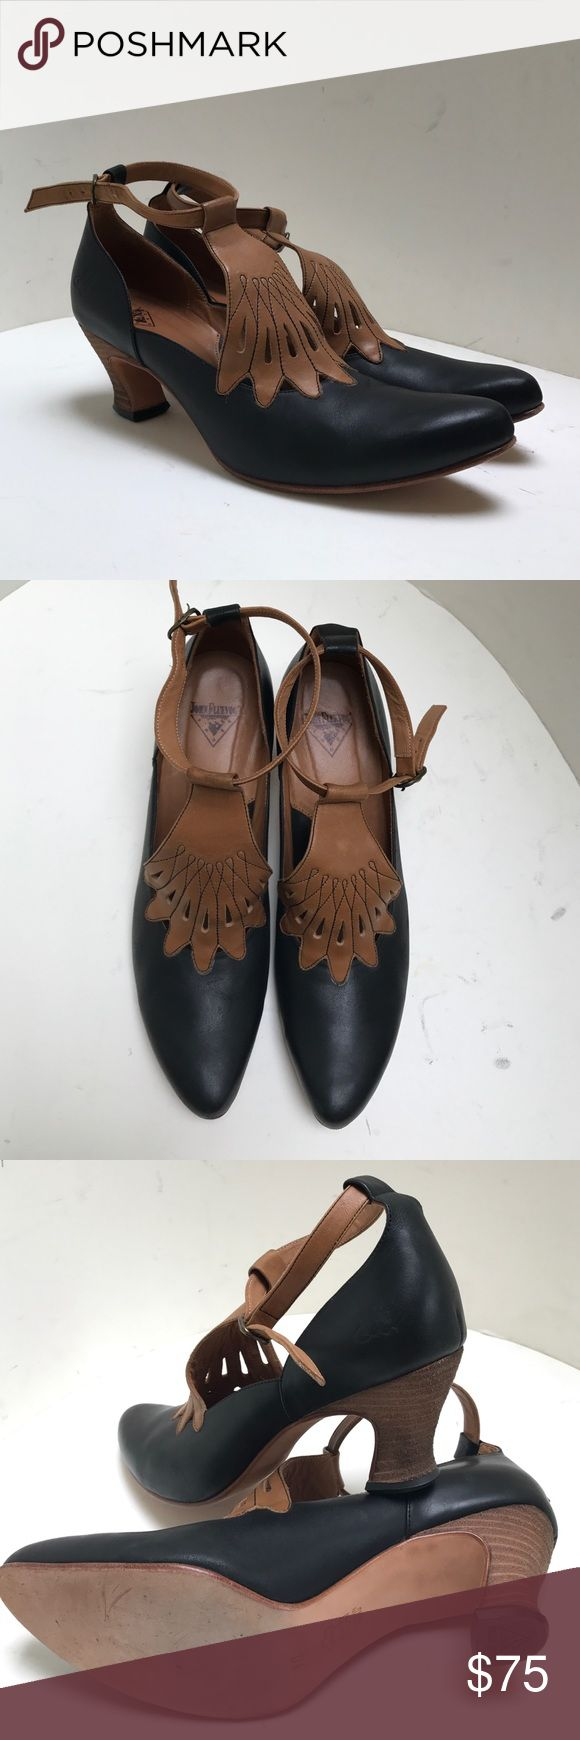 John Fluevog Mary Jane black ankle strap shoes Worn only once! John Fluevog Mary Jane black heel ankle strap shoes. Black with tan detailing. Size 10 john fluevog Shoes Heels